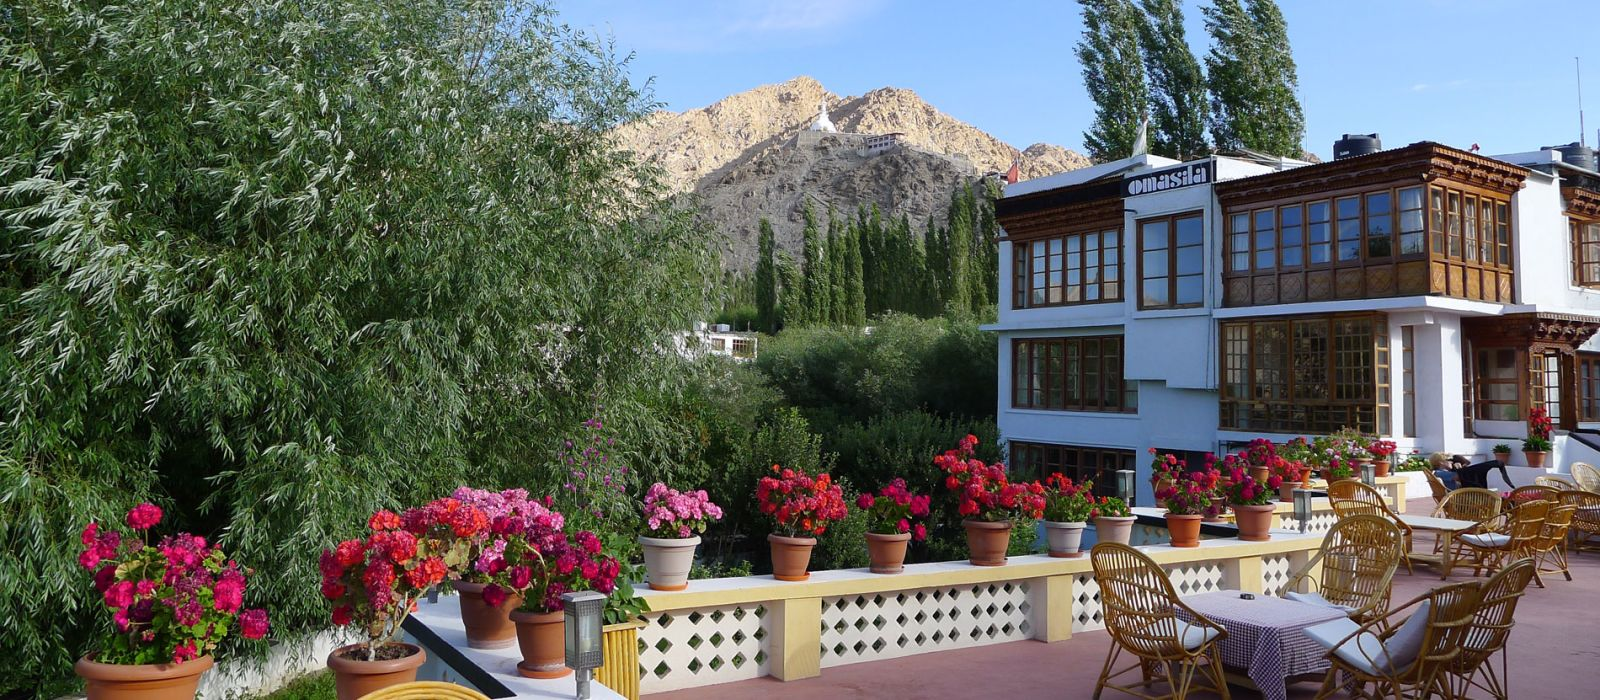 Hotel Omasila Himalayas